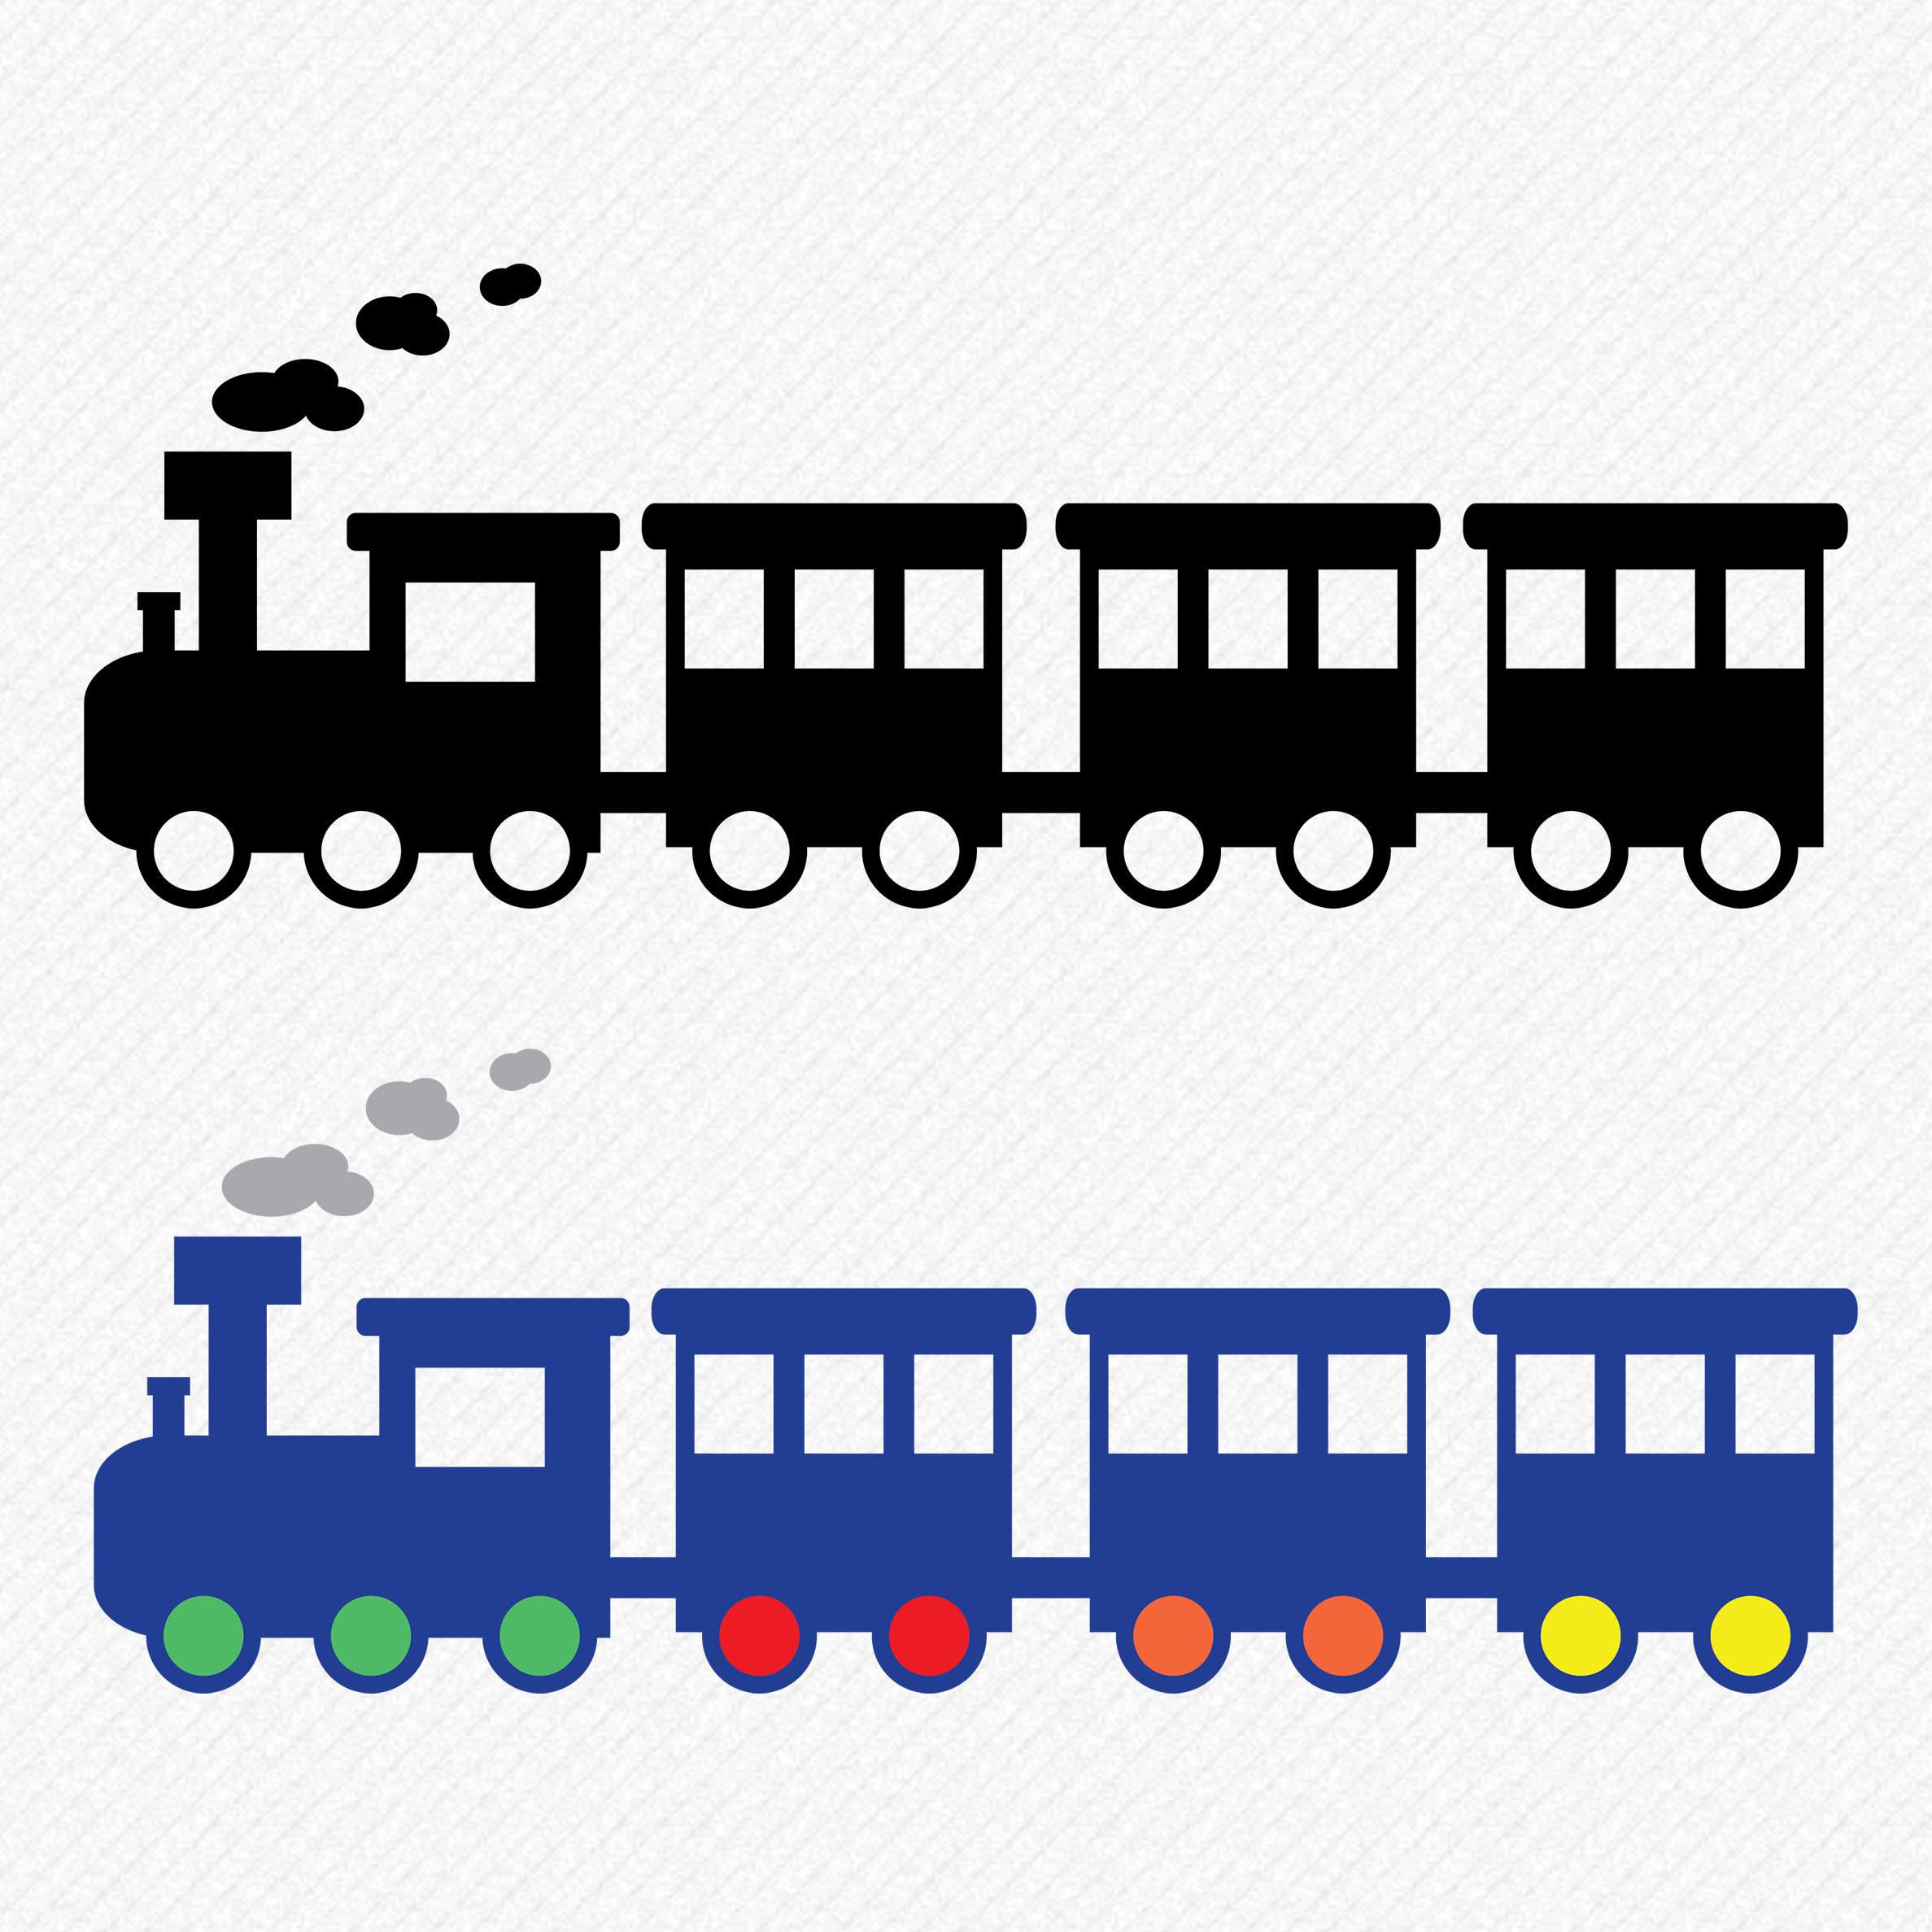 2375x2375 Train Silhouette, Train Svg, Train Clipart, Train Vector, Train